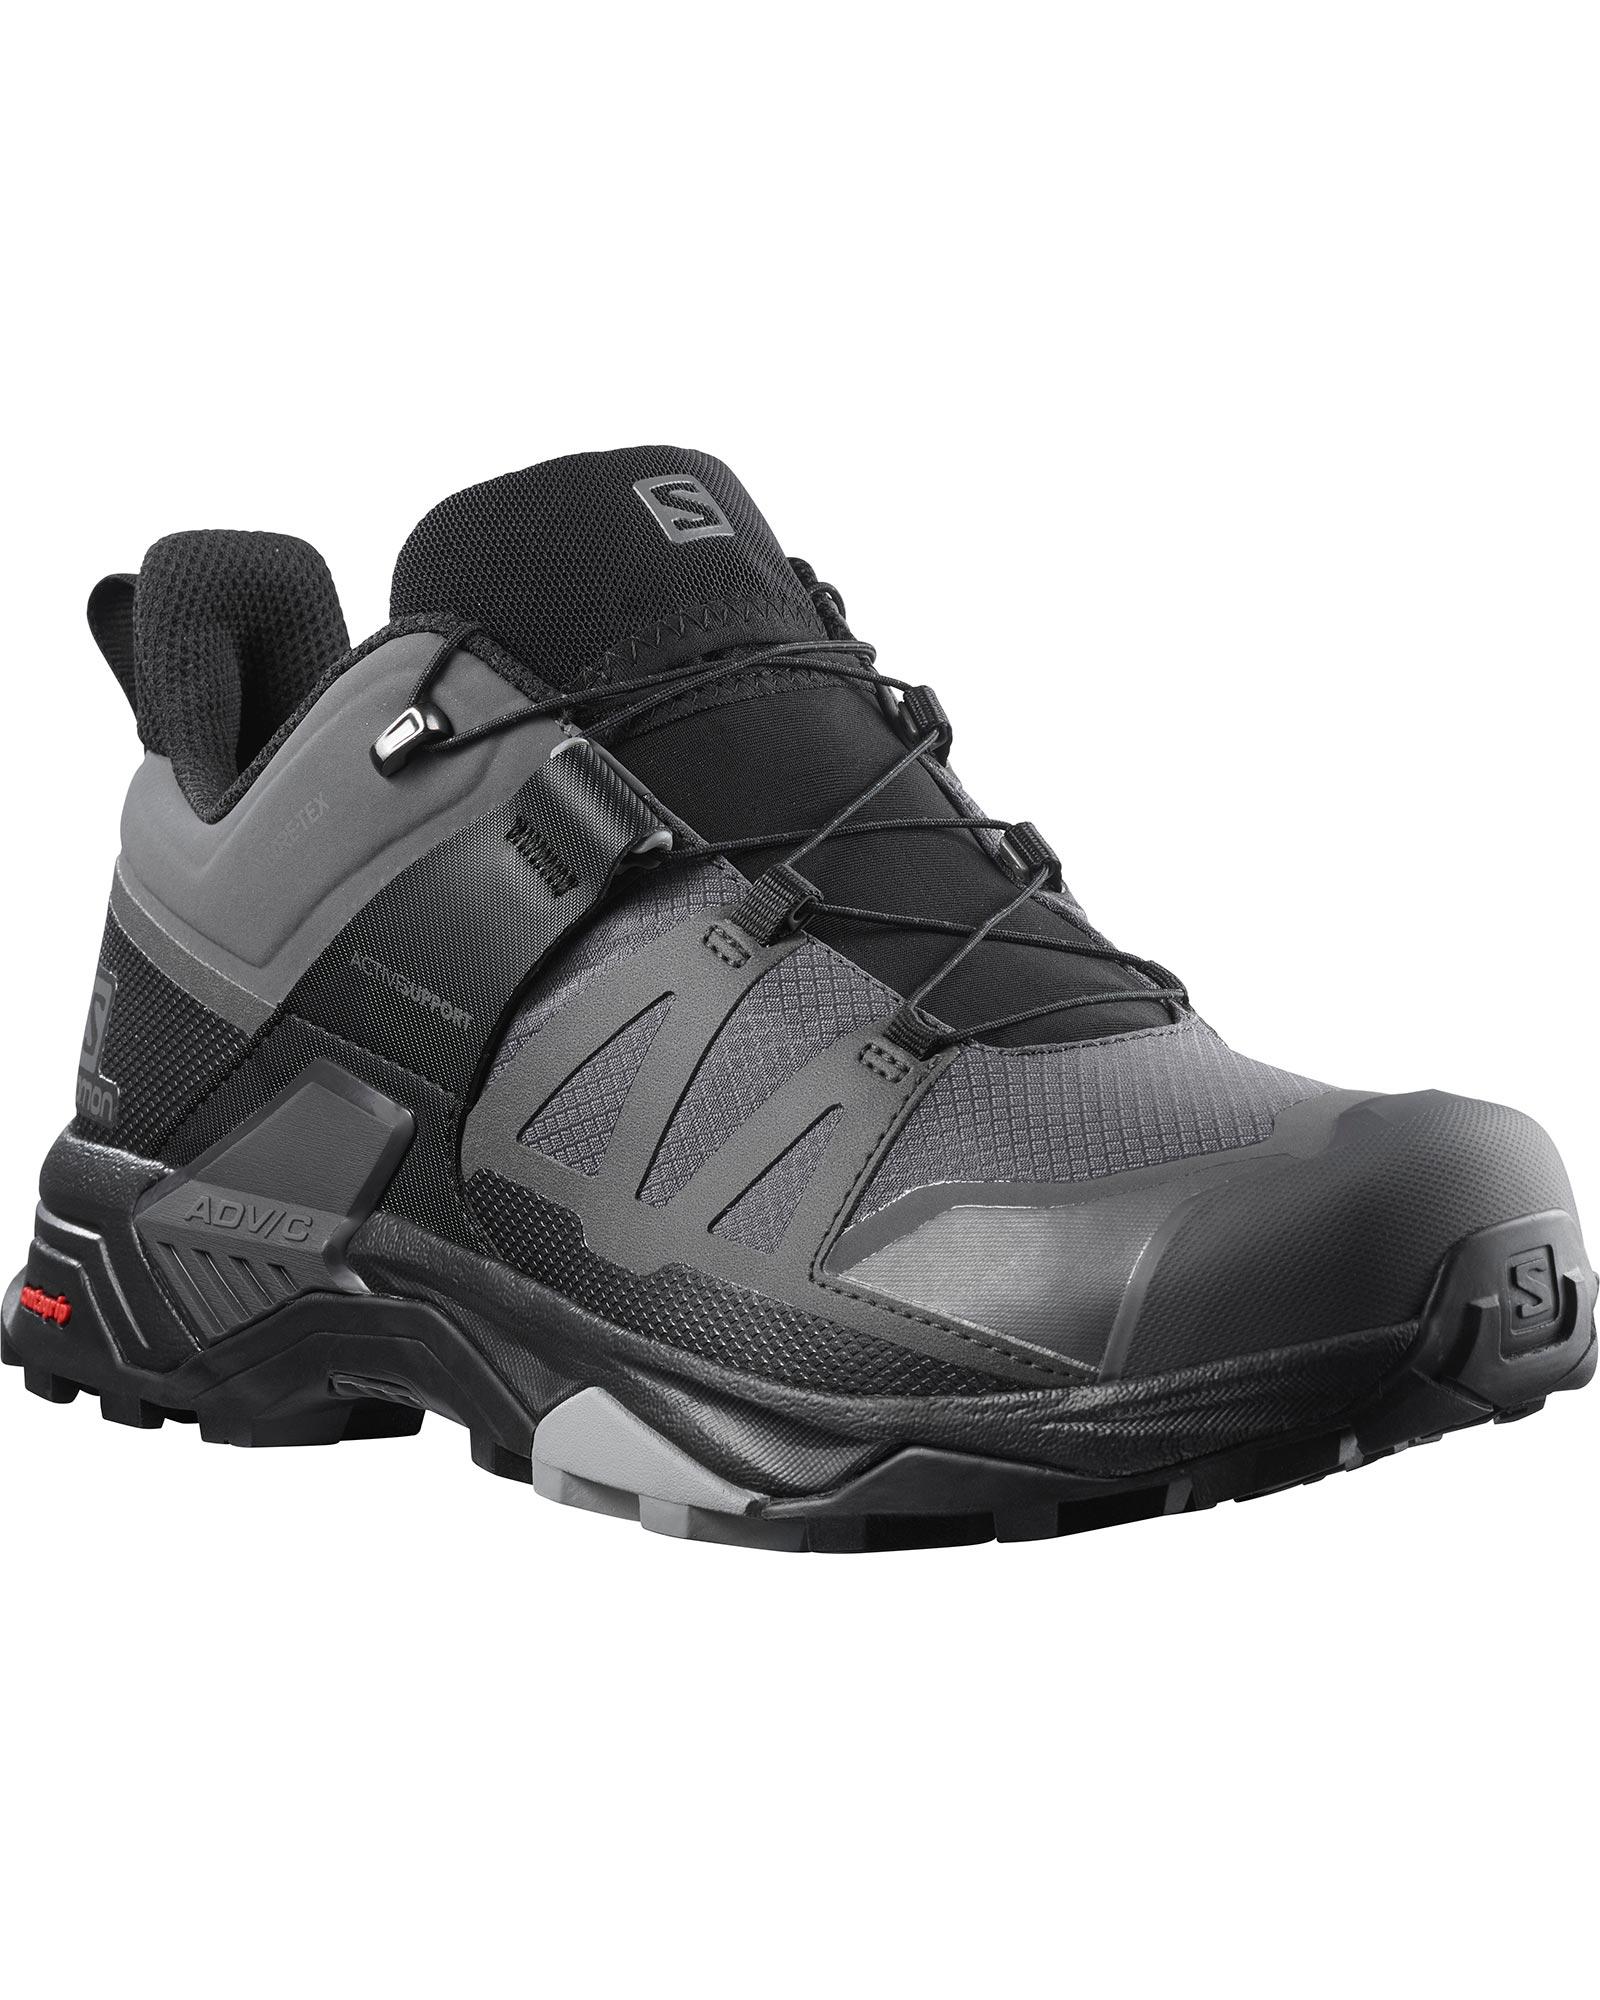 Salomon Men's X Ultra 4 GORE-TEX Walking Shoes 0